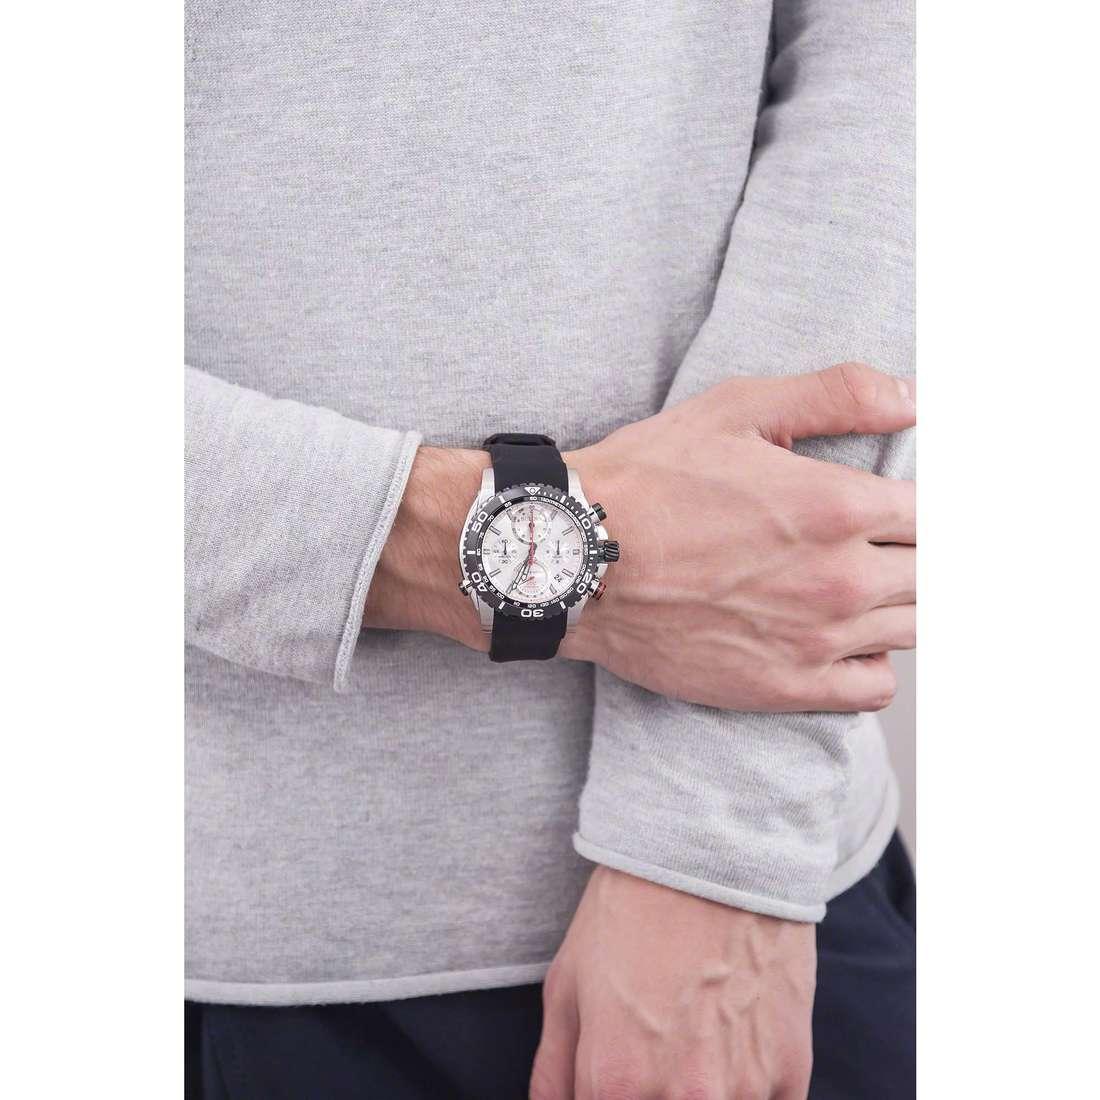 Bulova cronografi Champlain Chrono uomo 98B210 indosso